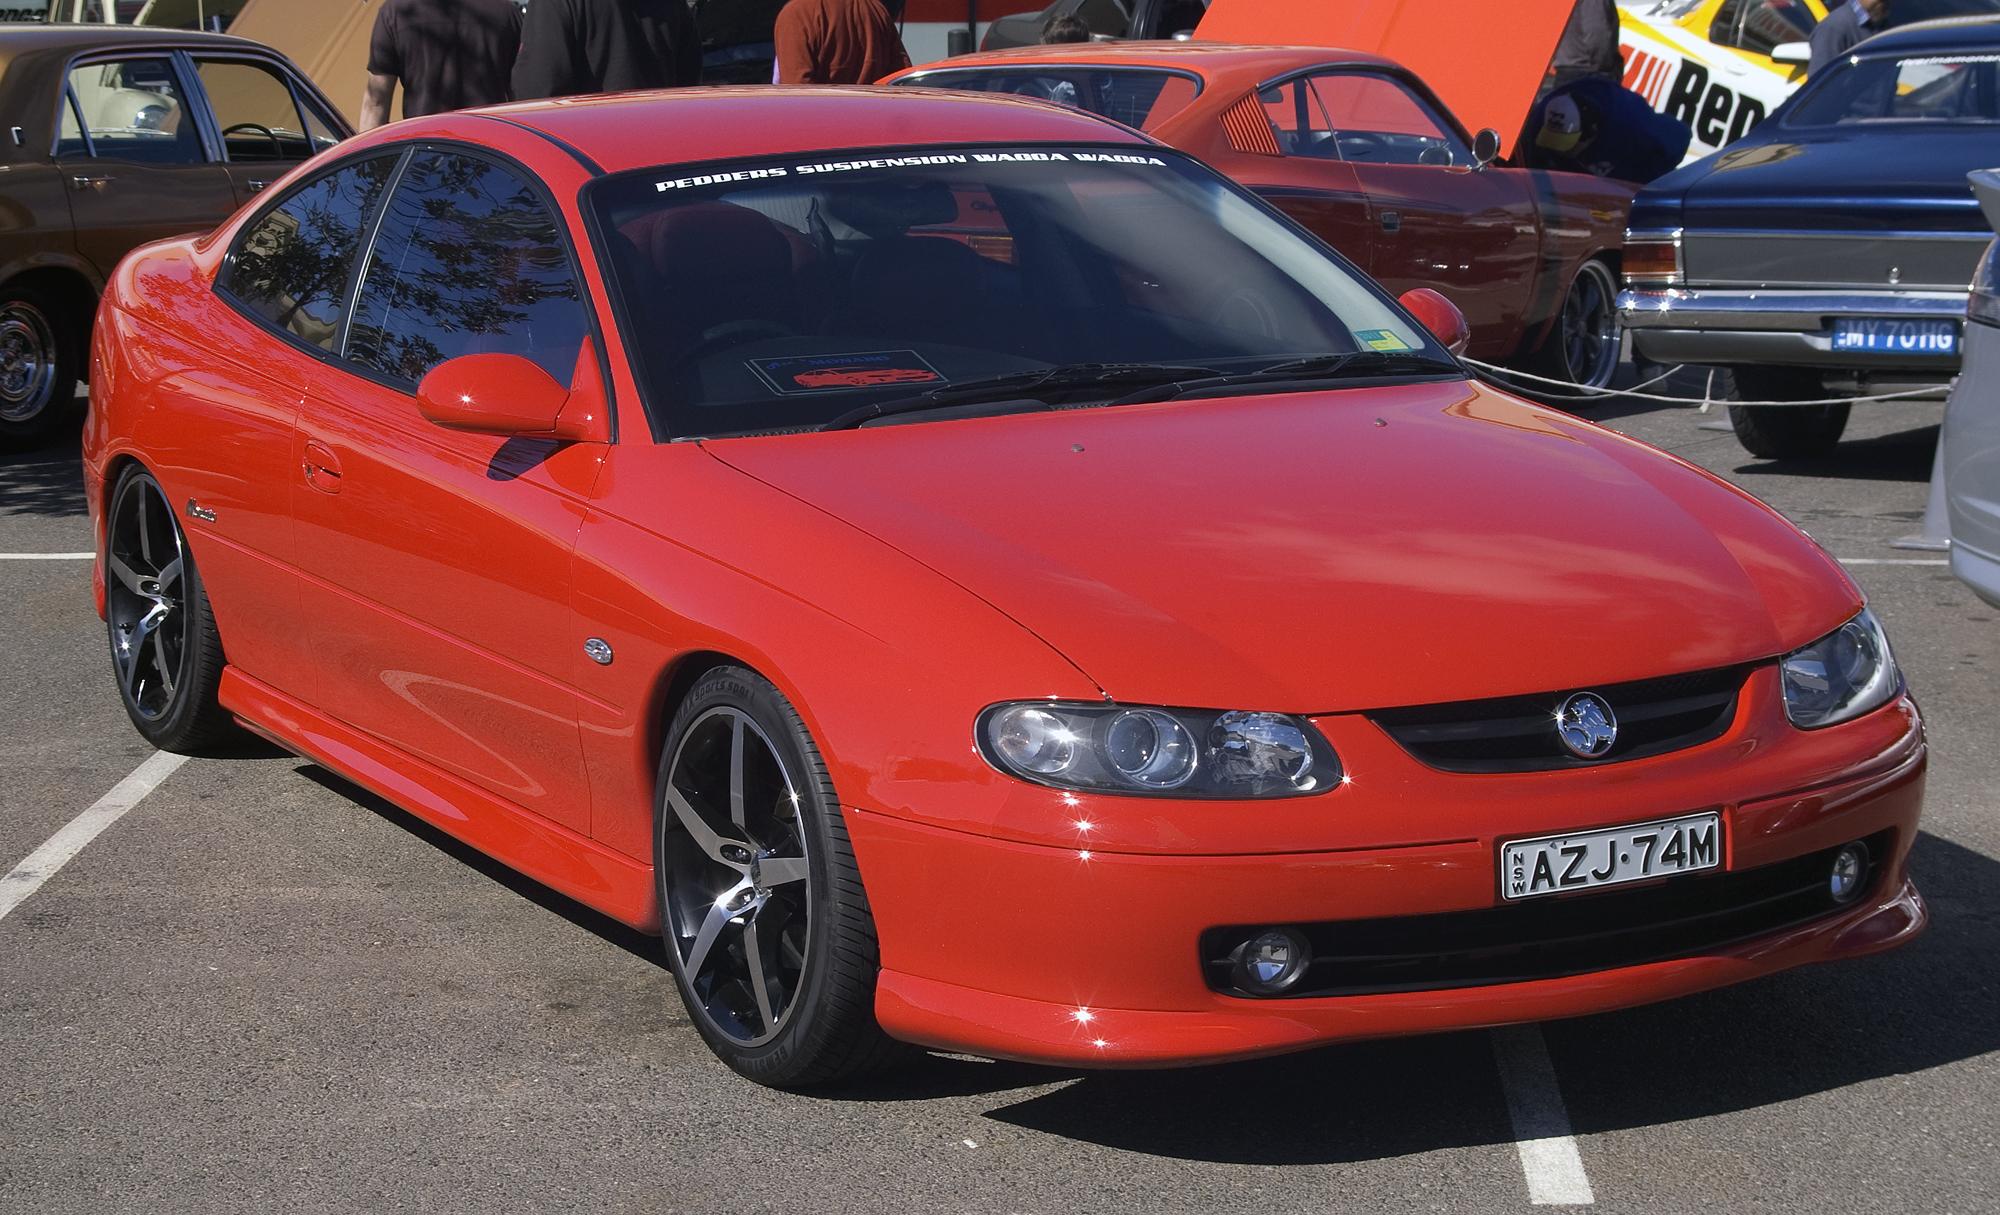 Hsv Cars For Sale Melbourne